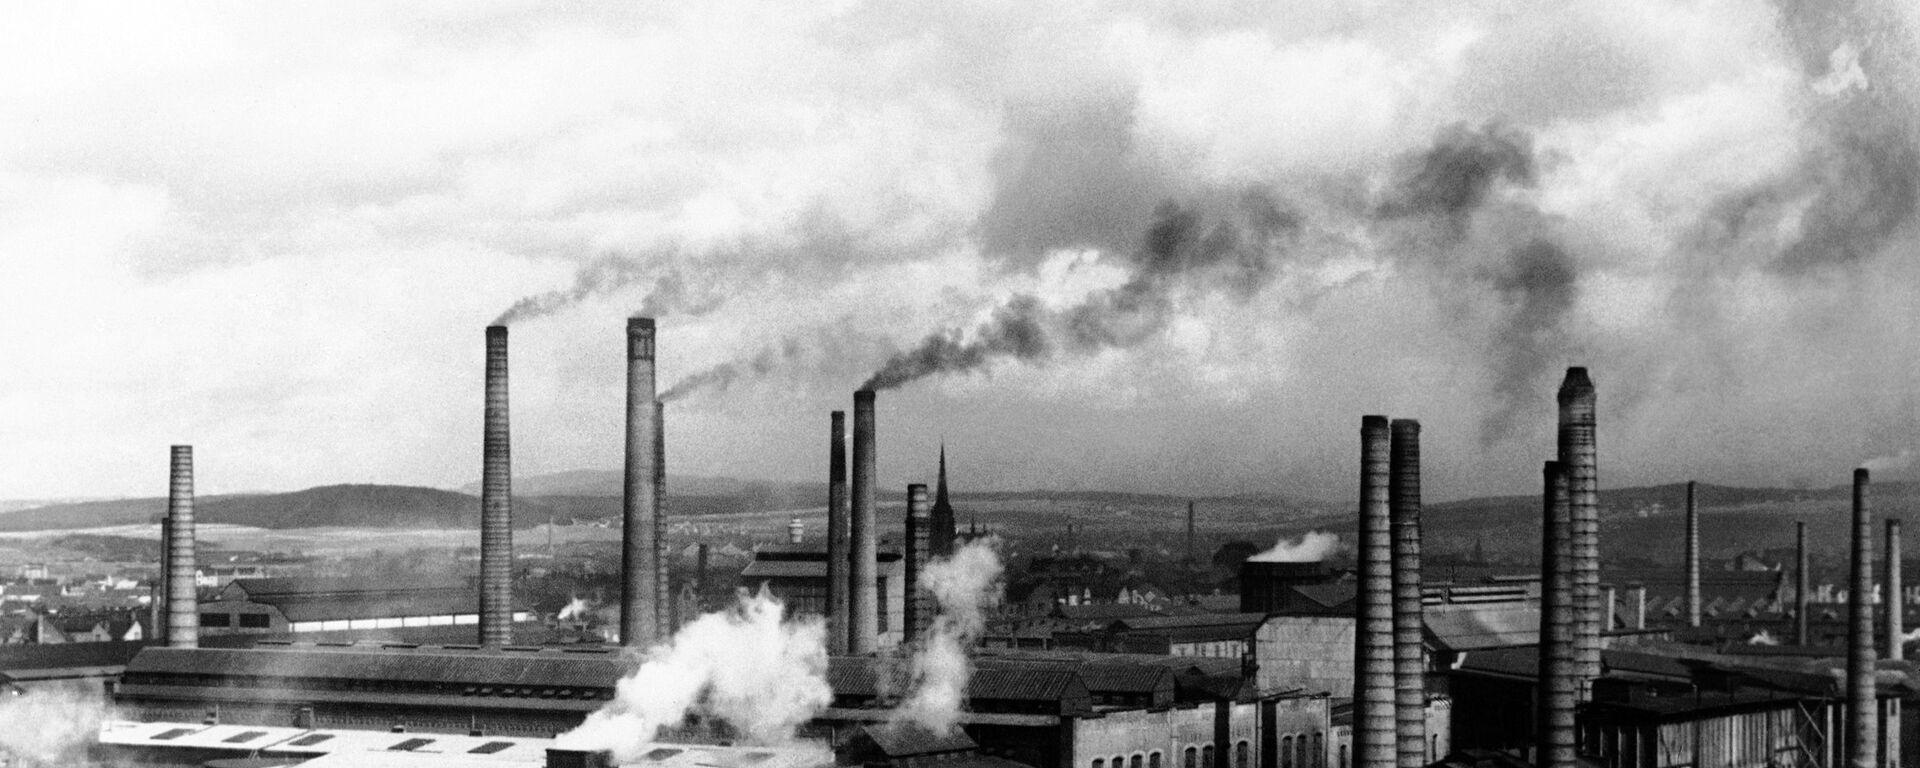 Továrna Škody v Plzni v roce 1938 - Sputnik Česká republika, 1920, 29.04.2021